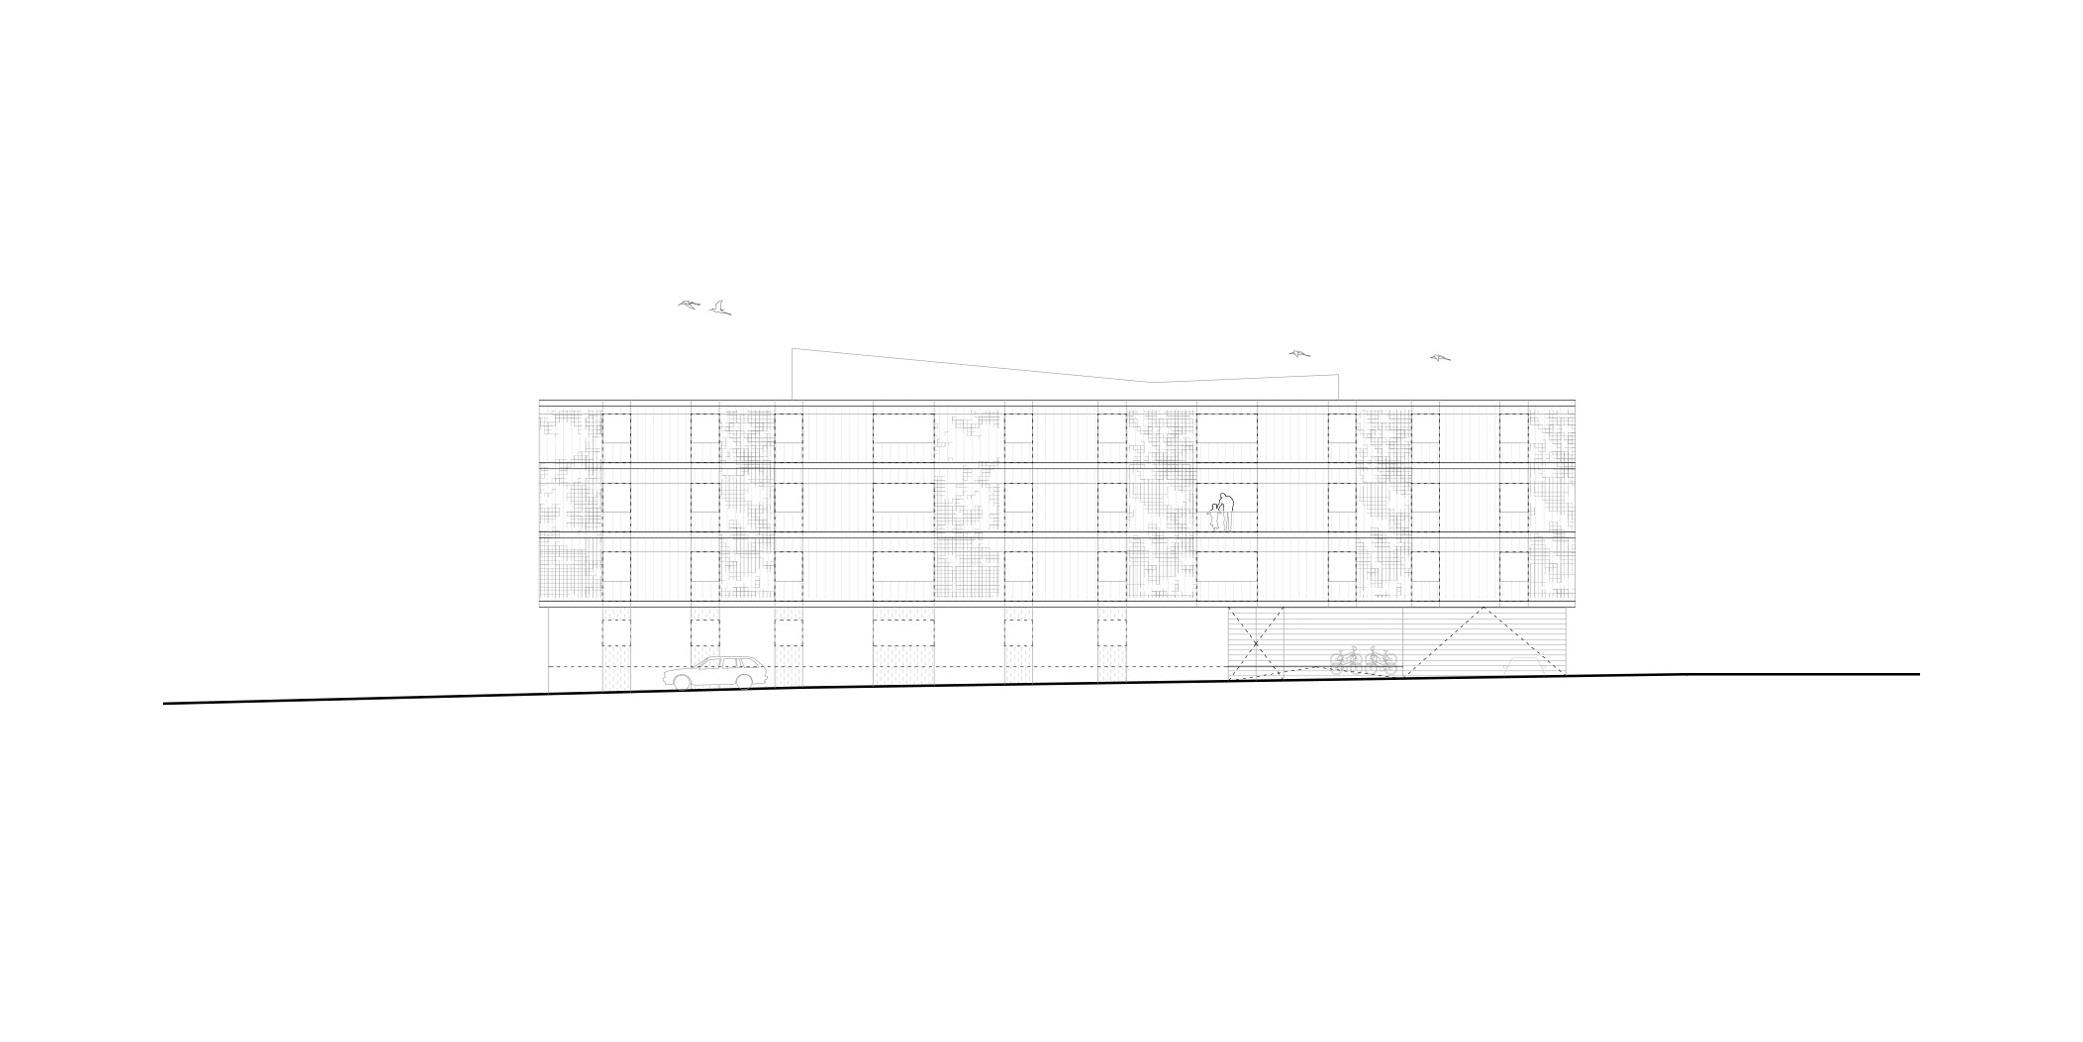 Terrasa housing OCA ARCHITEctS OCA ARQUITECTOS architecture design Hernan Lleida Bernardo 8